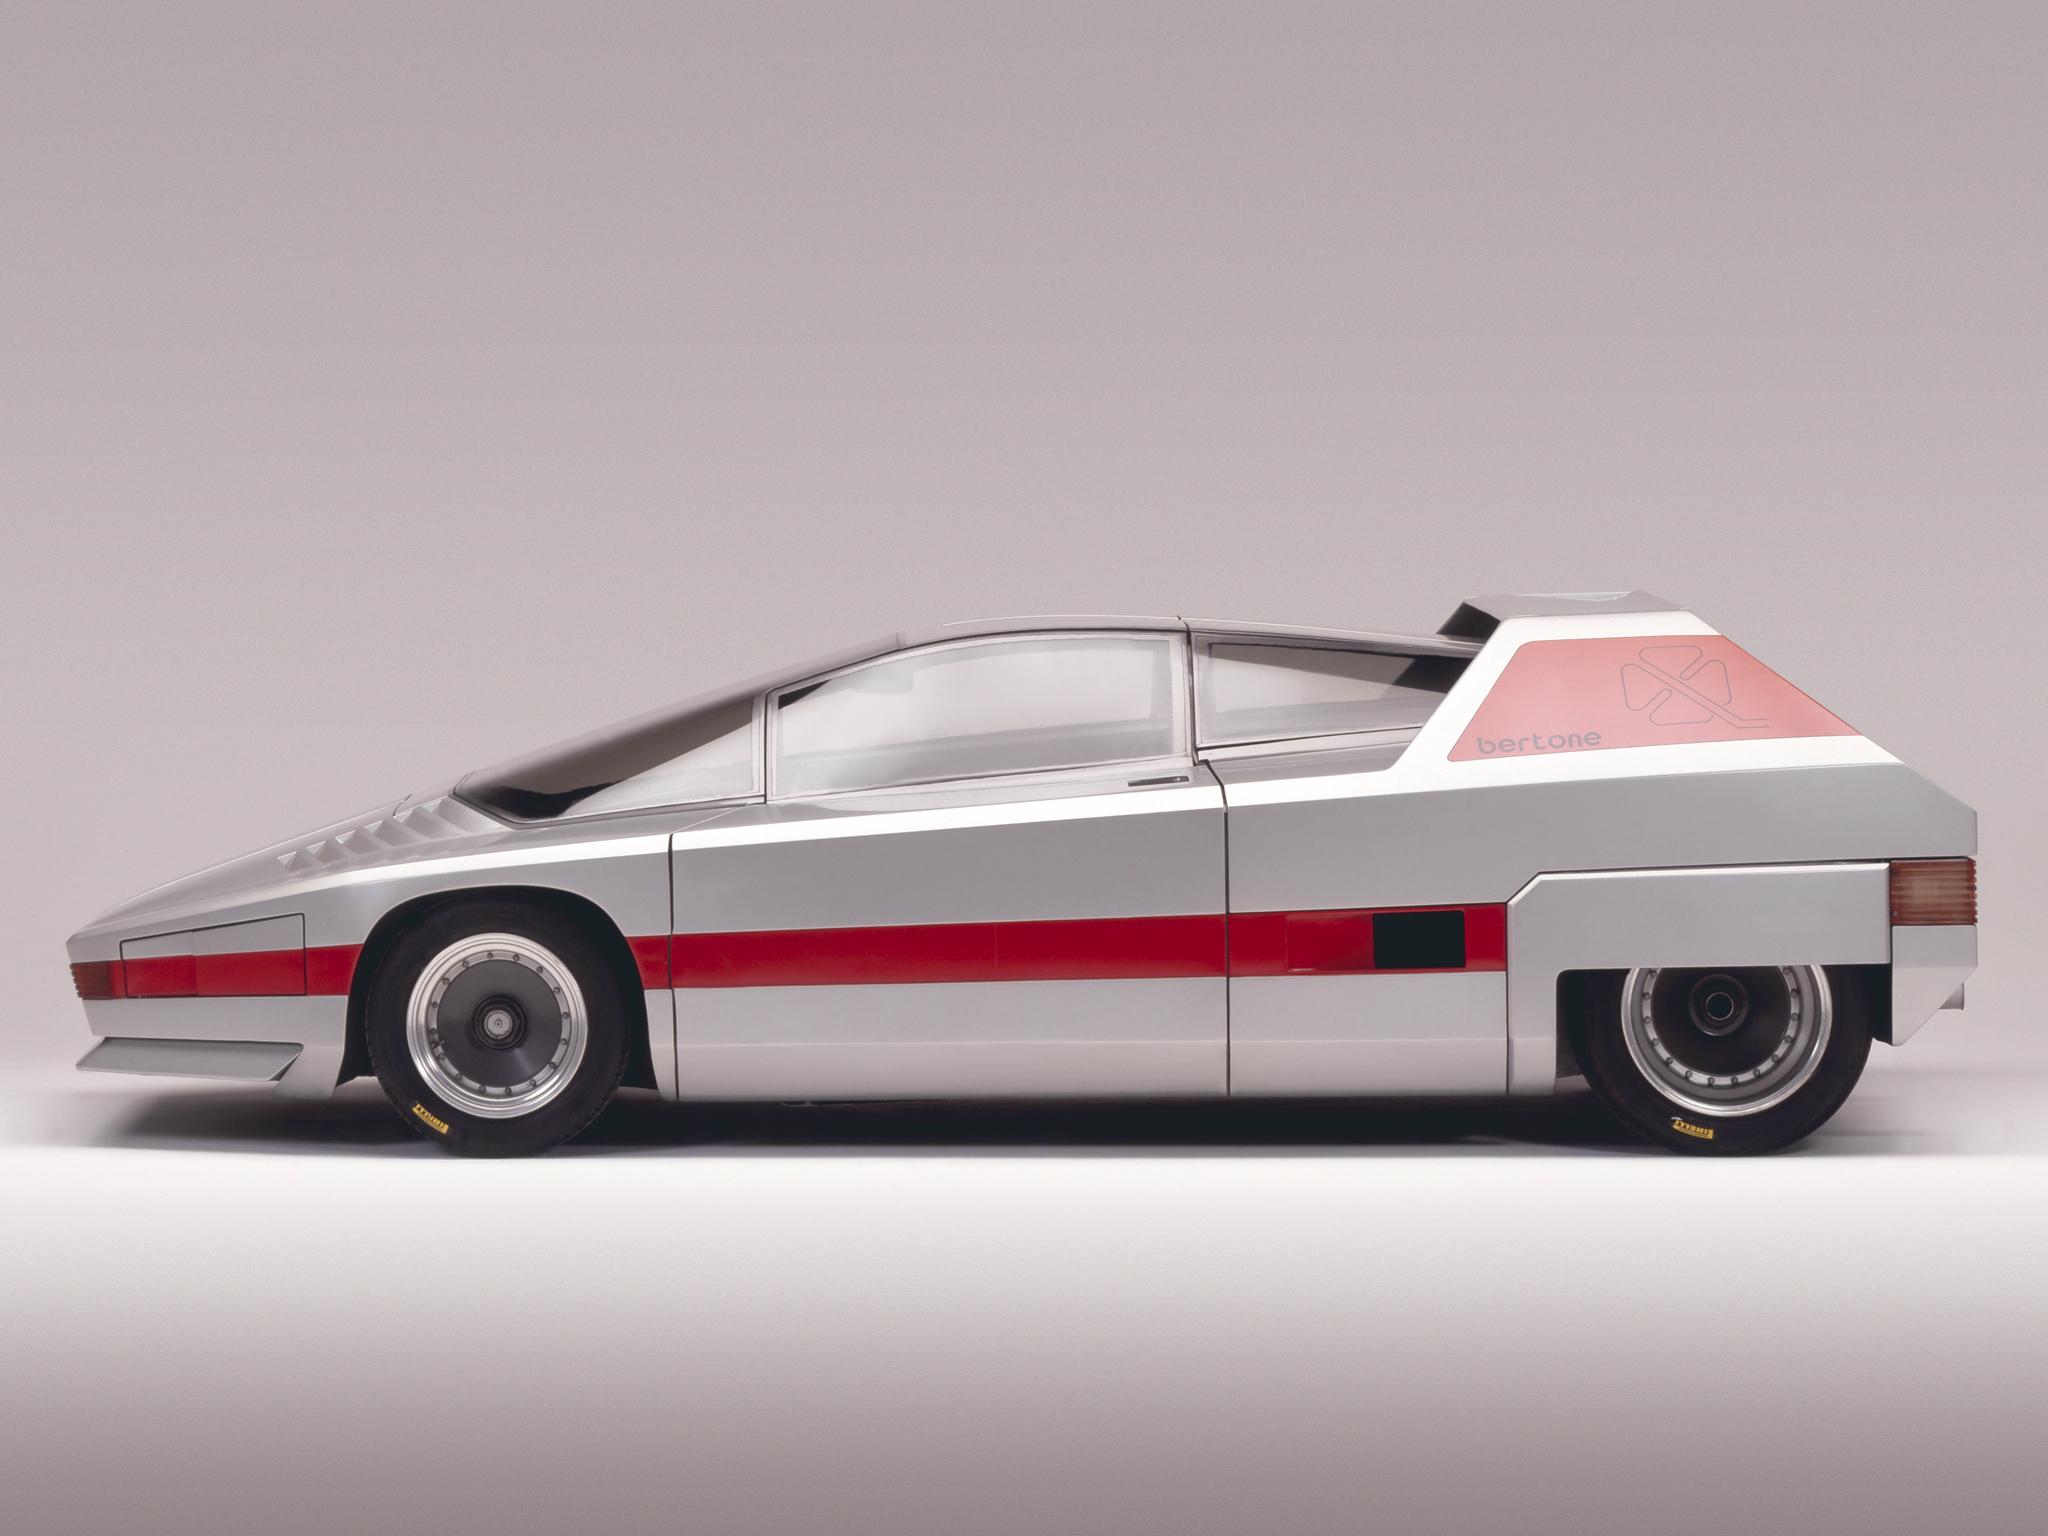 2017 Alfa Romeo 4c >> 1976 Alfa Romeo Navajo Concept, the 33 Stradale's Ugly ...